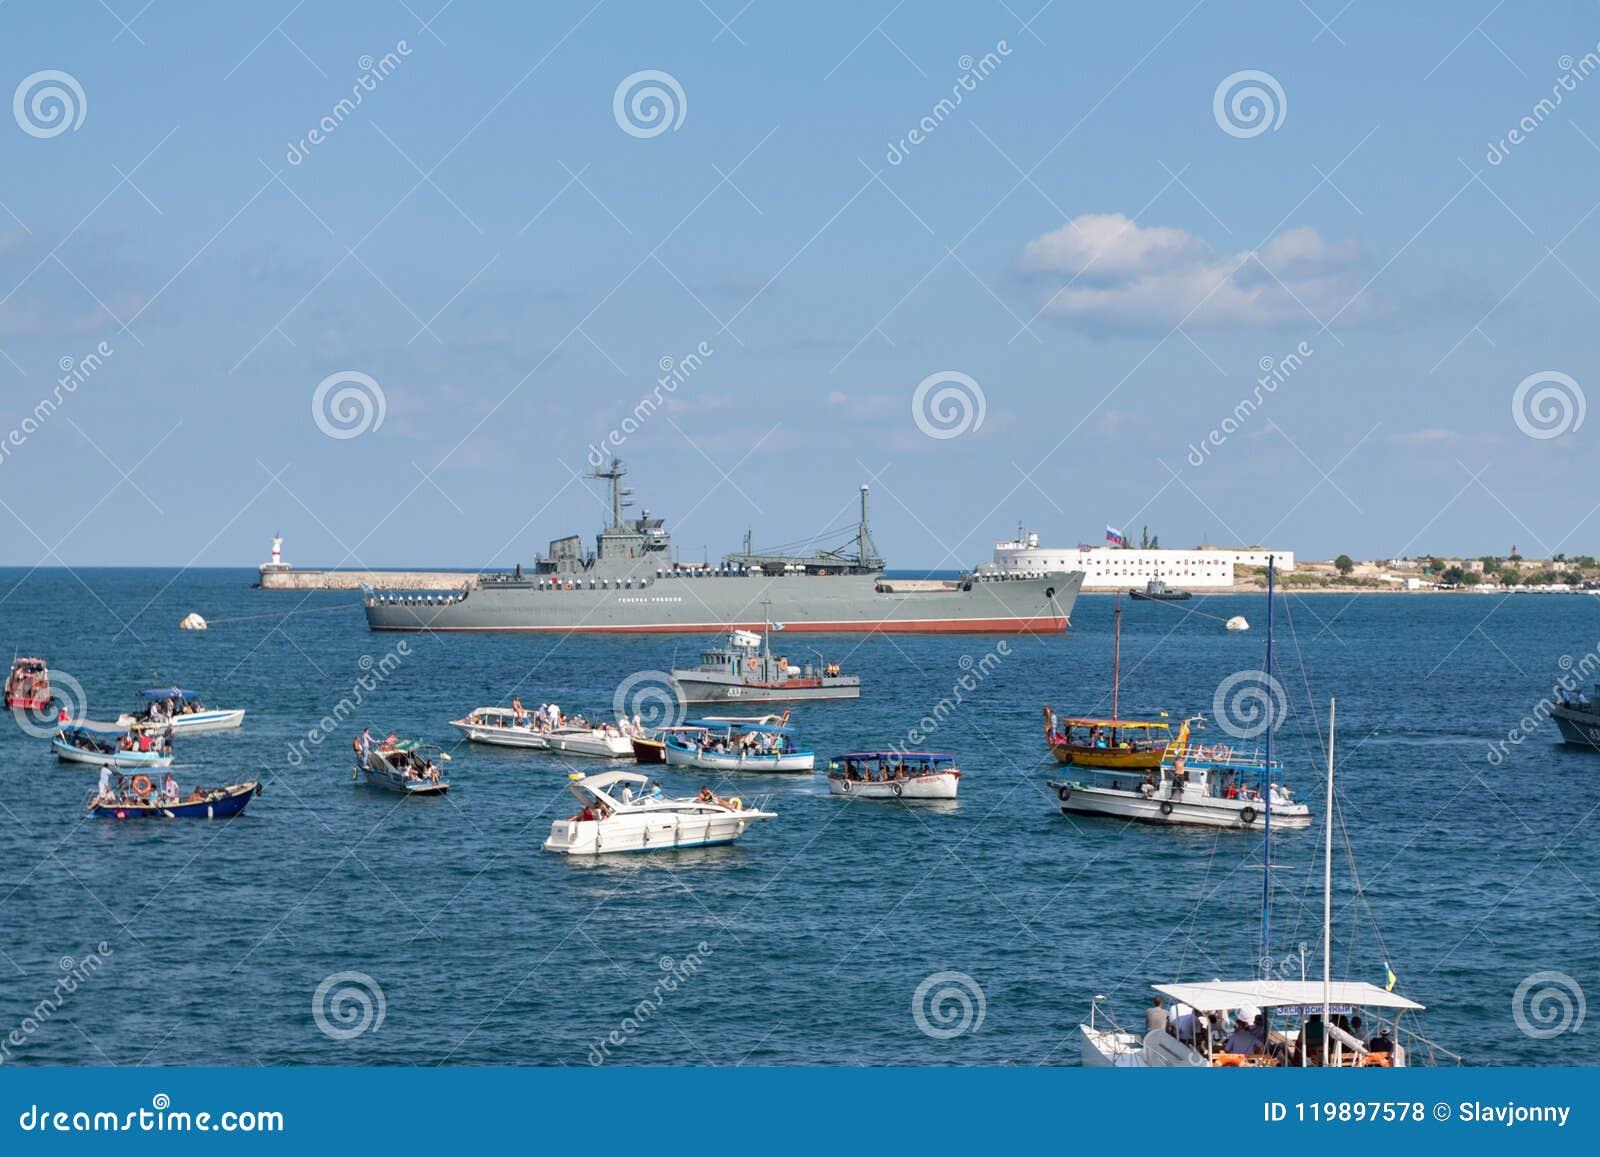 Sewastopol, Ukraine - 31. Juli 2011: Das Militärschiff